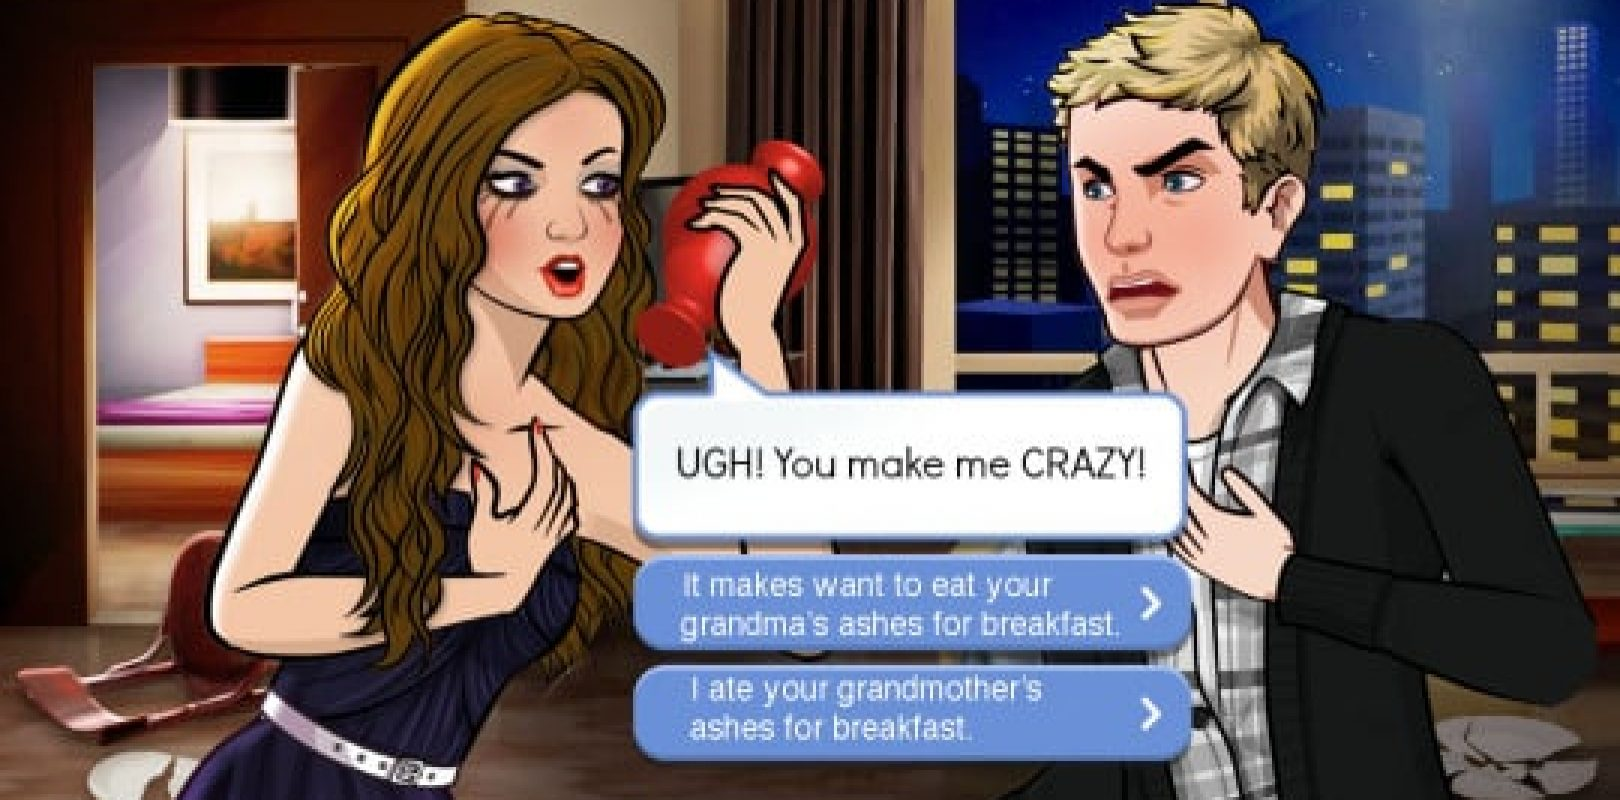 Moquetas online dating